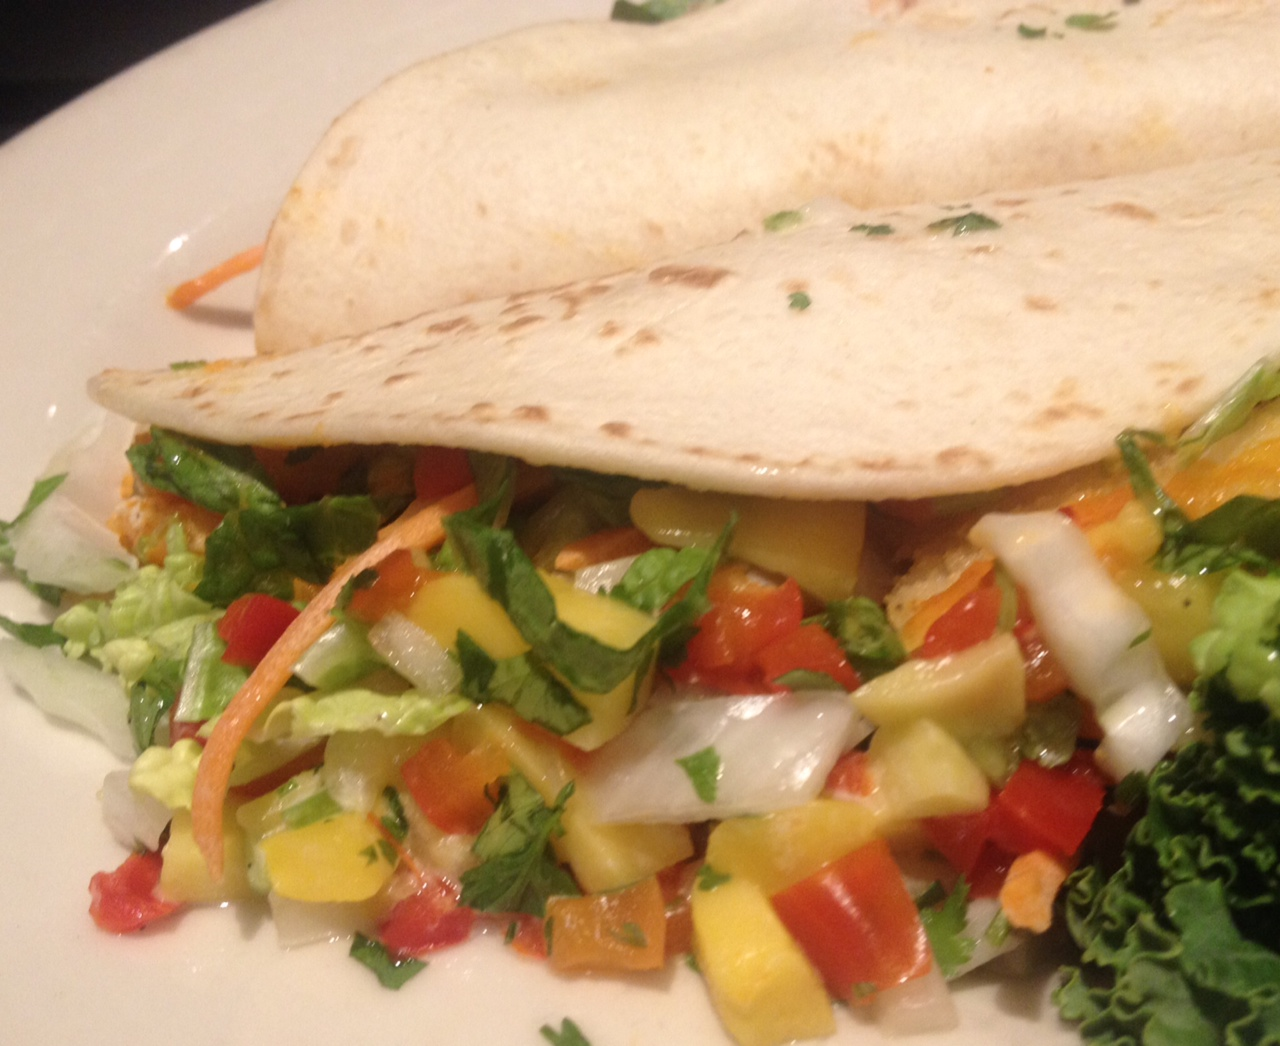 talapia tacos via dallasfoodnerd.com